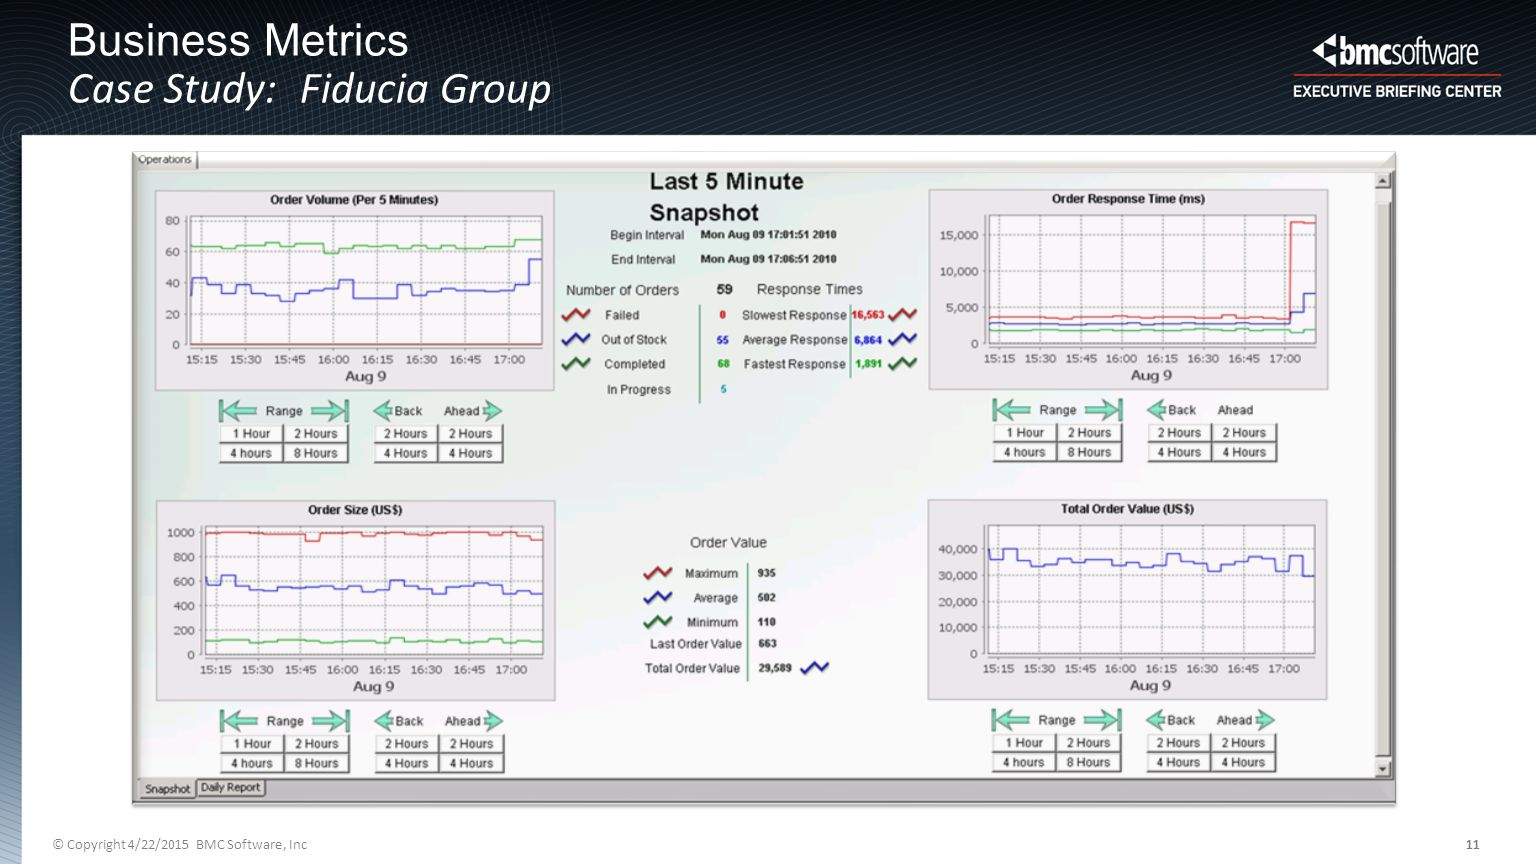 © Copyright 4/22/2015 BMC Software, Inc11 Business Metrics Case Study: Fiducia Group